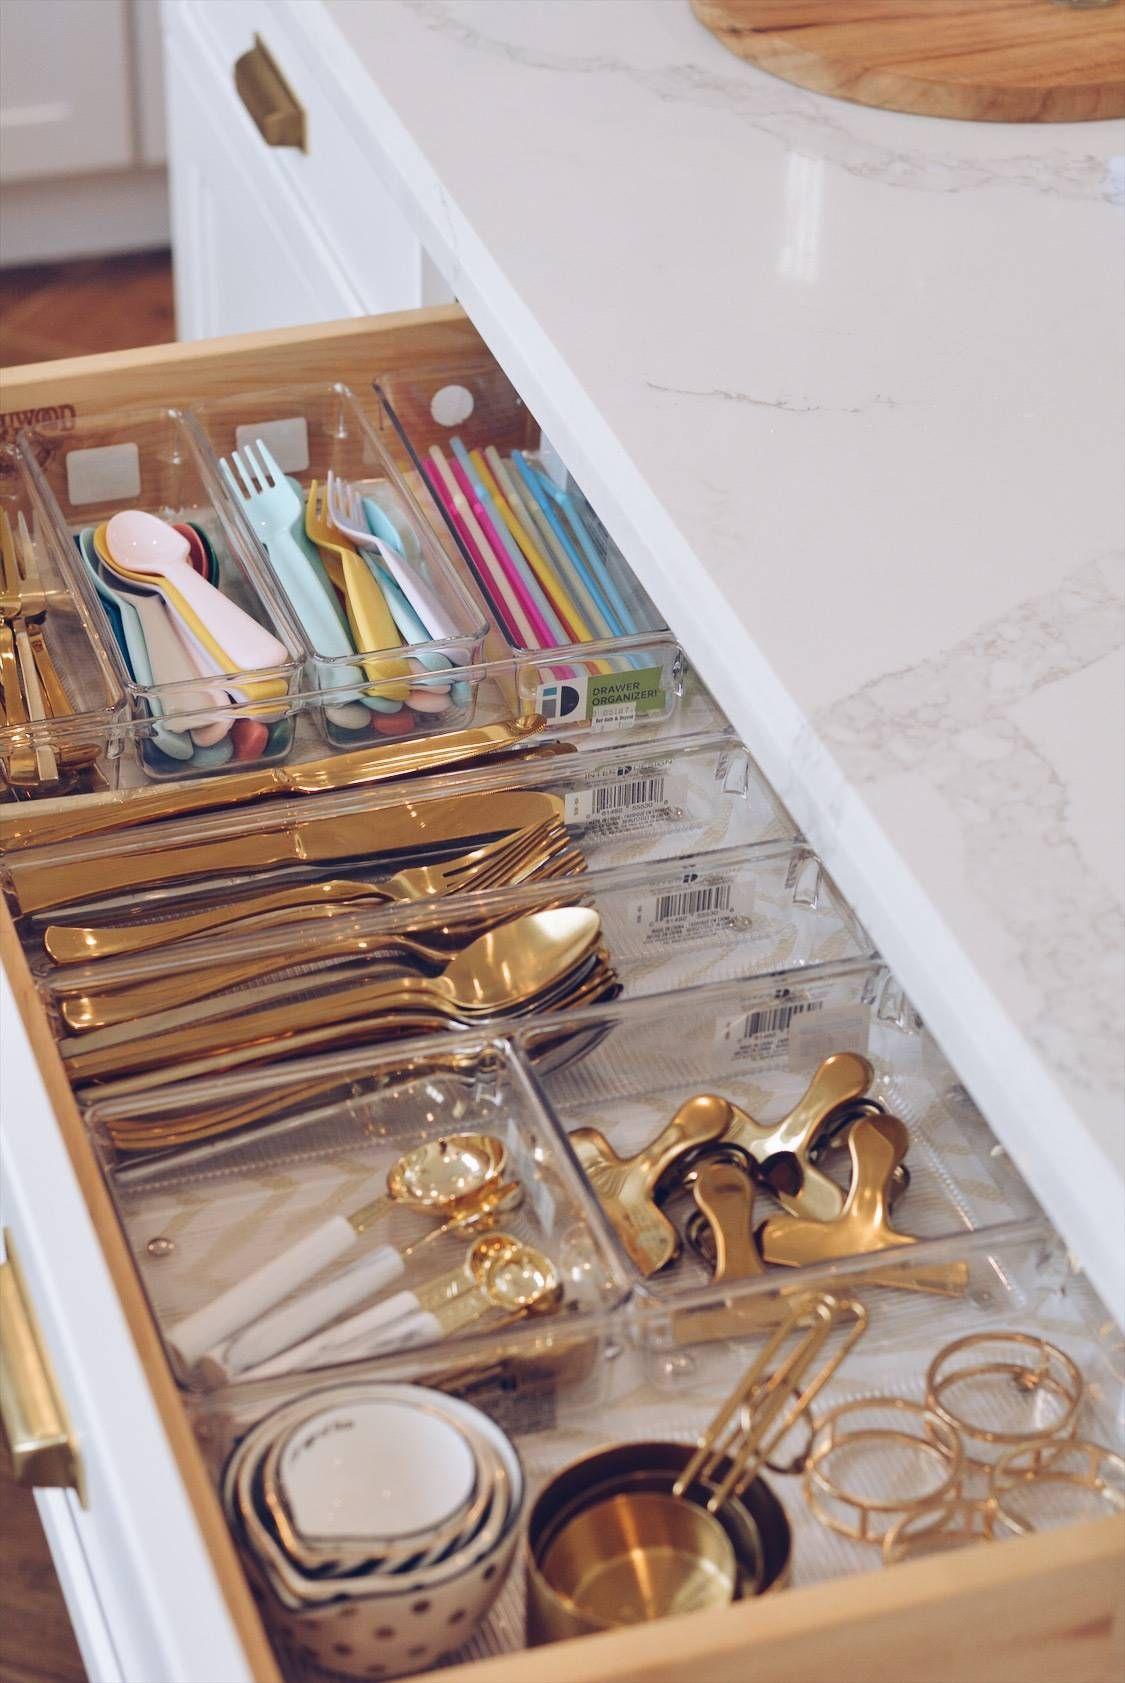 Kitchen Organization How To Organize Your Kitchen Drawers The Pink Dream Kitchen Drawer Organization Small Kitchen Organization Kitchen Drawers Best way to organize kitchen drawers